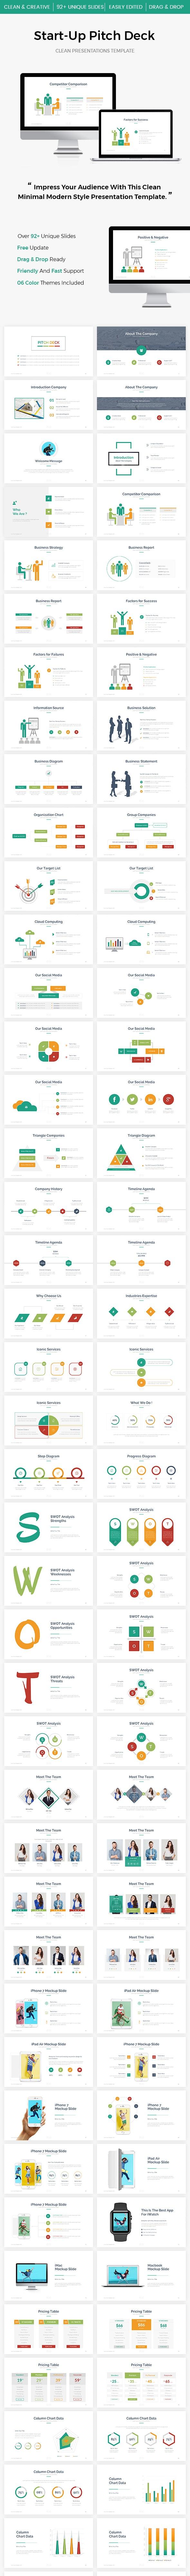 Start-Up Pitch Deck PowerPoint Template 2017 - PowerPoint Templates Presentation Templates